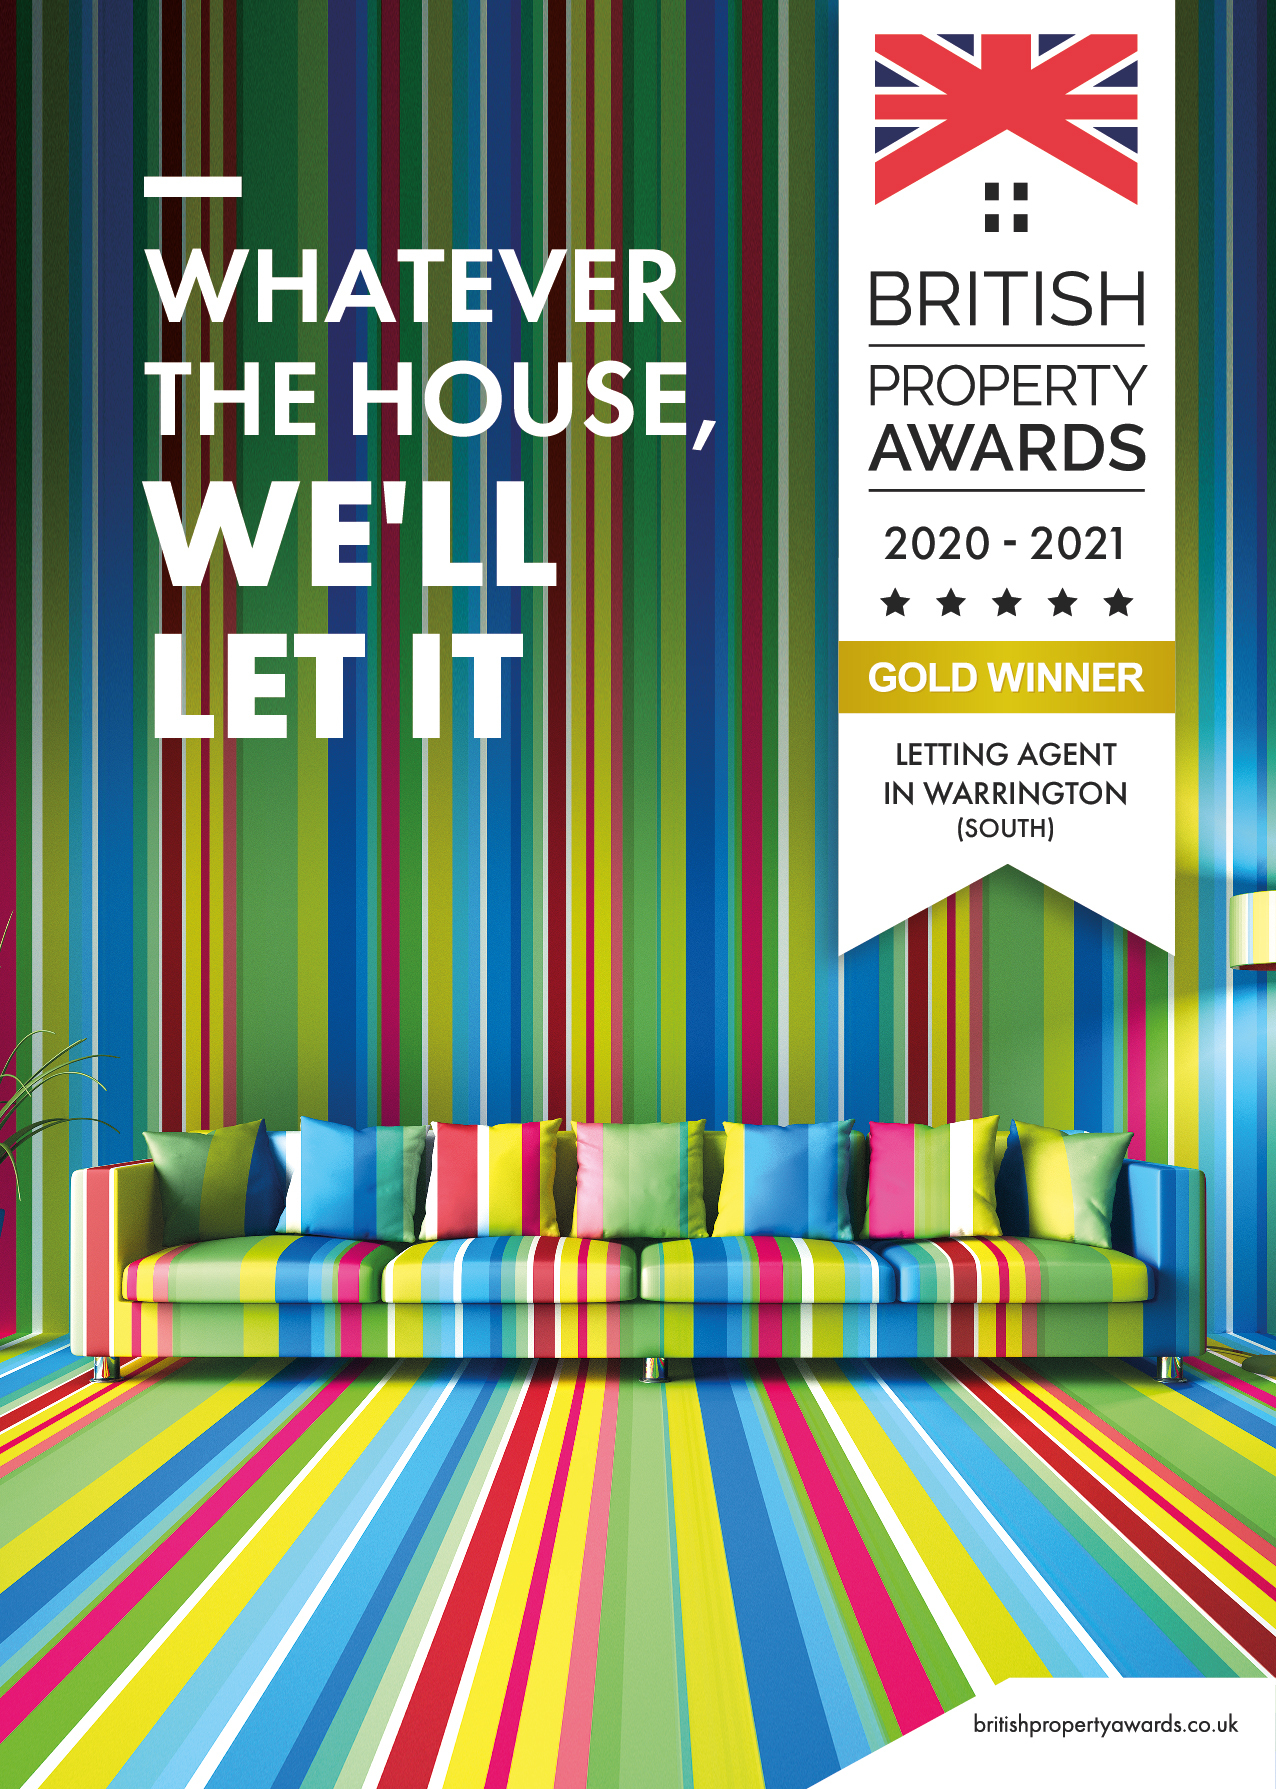 British Property Awards - Gold Winner - 2021